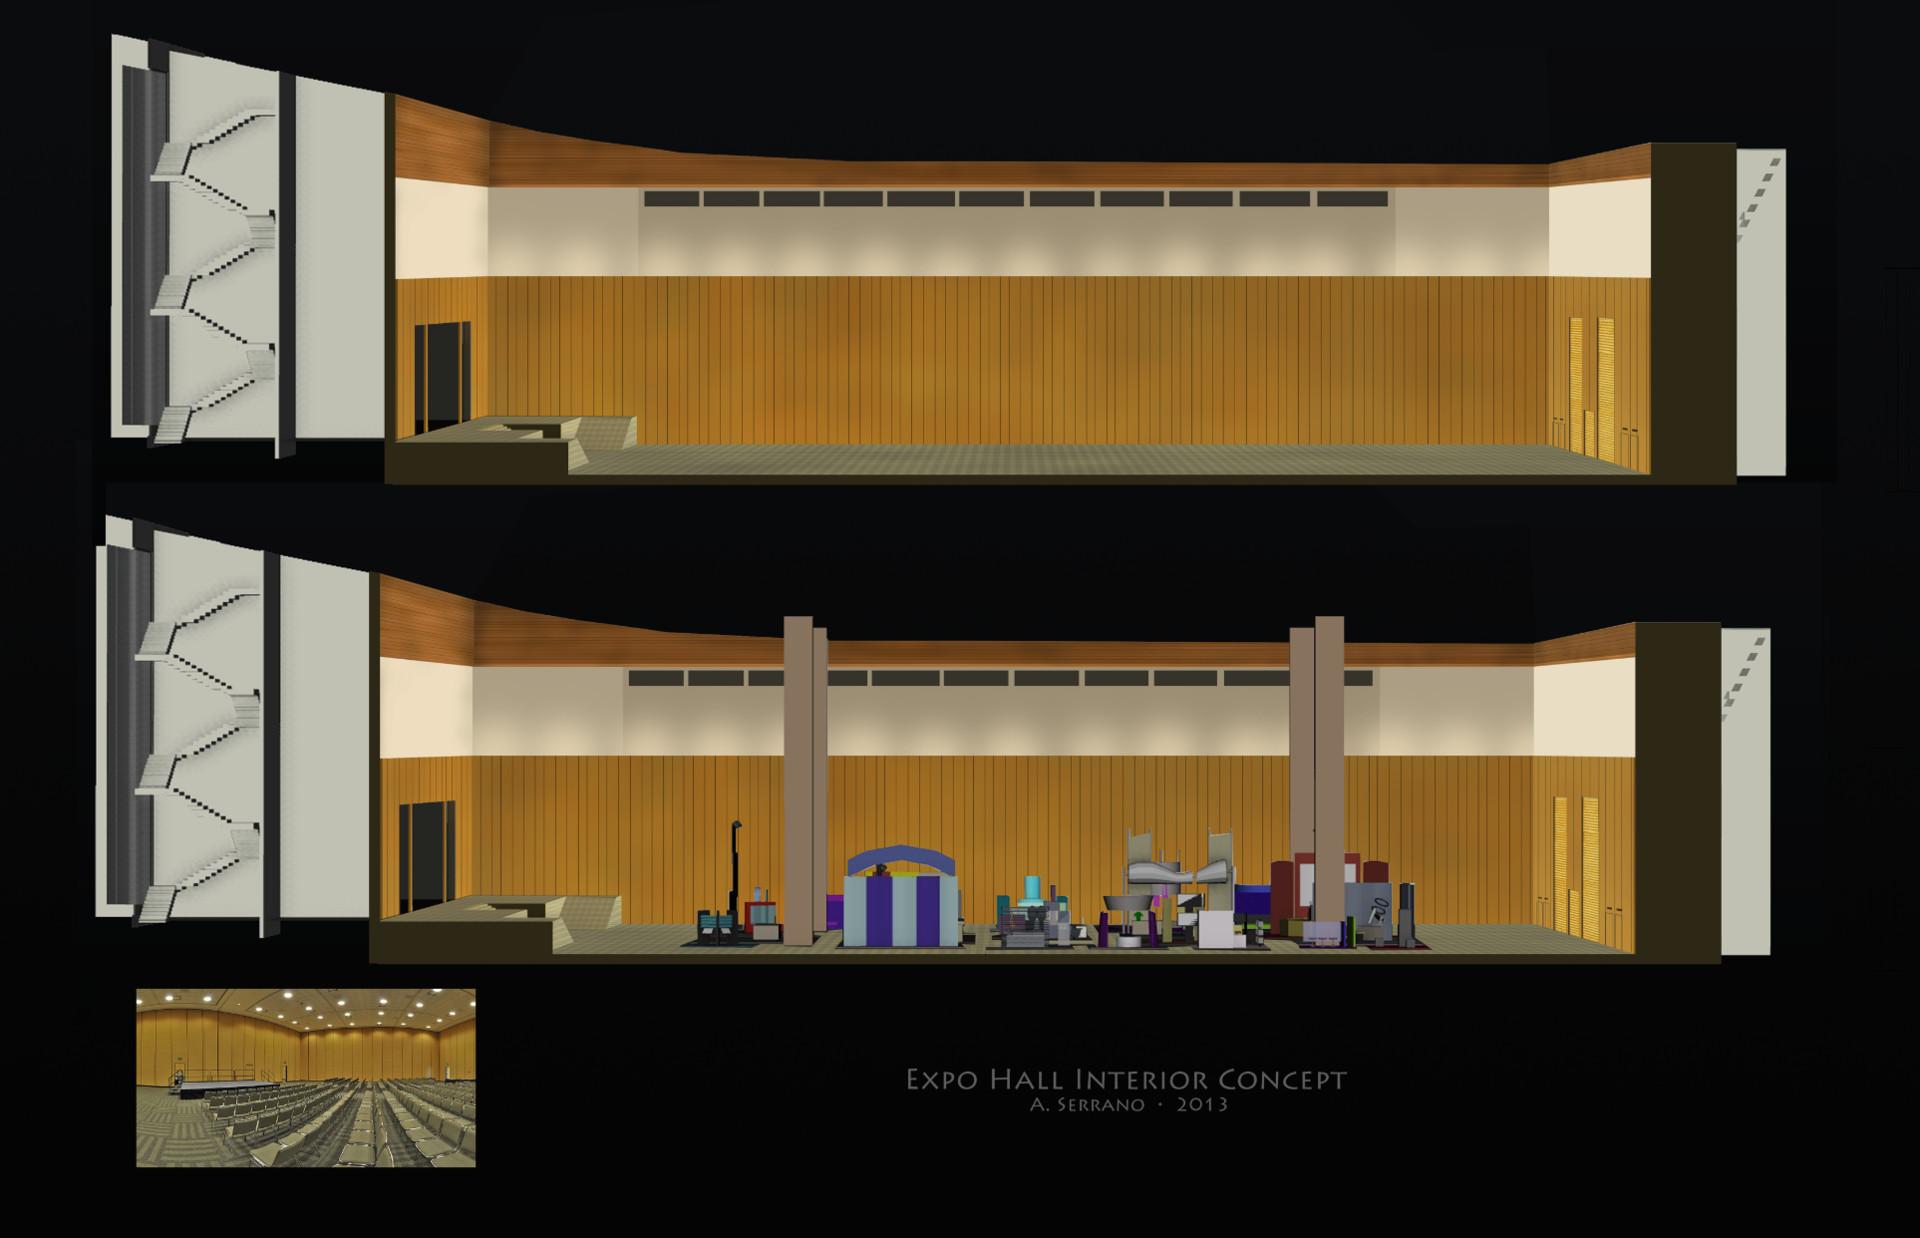 Interior concept 2